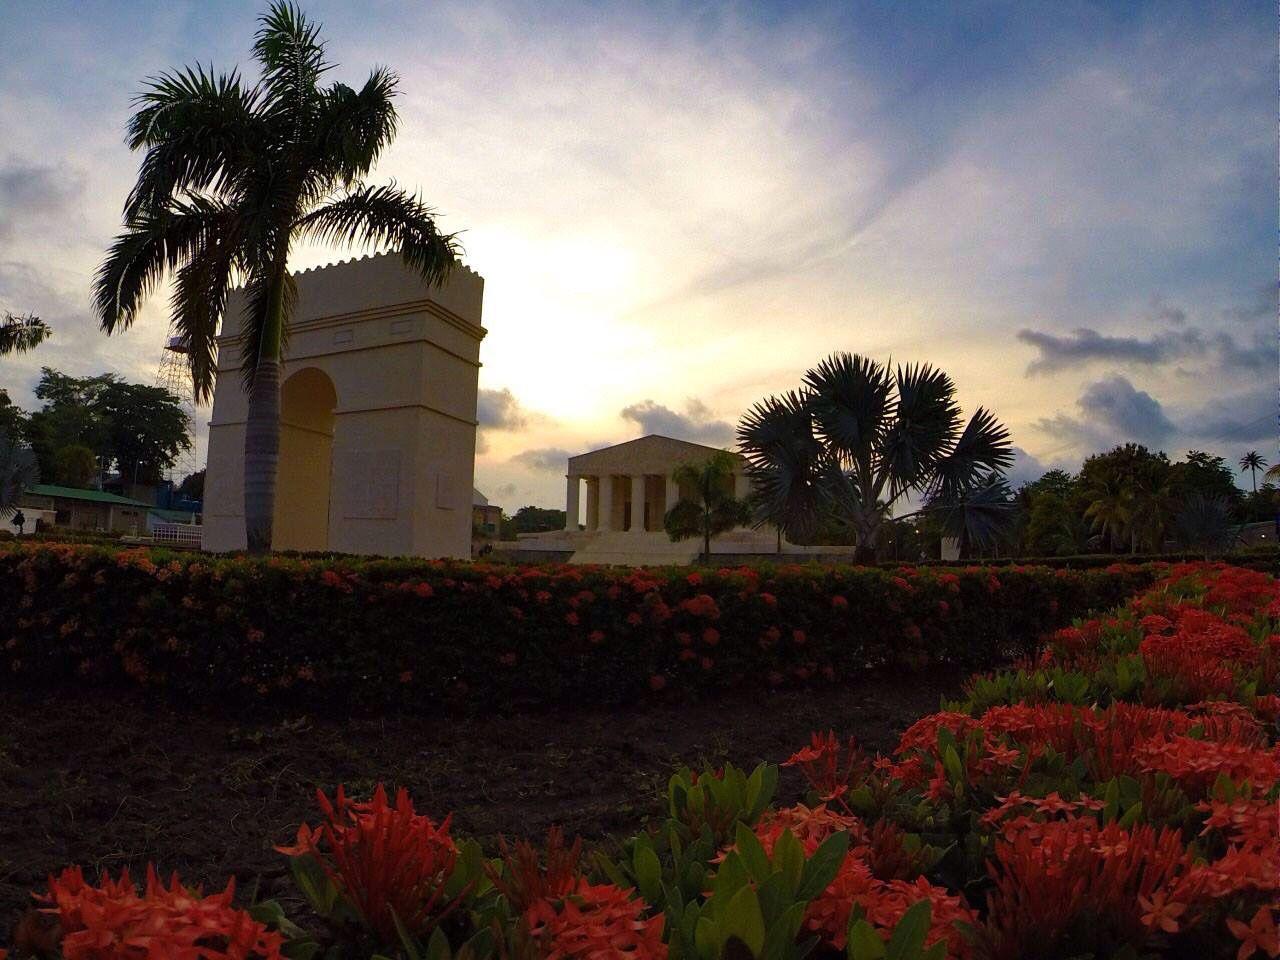 Parque Museo Infantería De Marina. Foto: co.pinterest.com